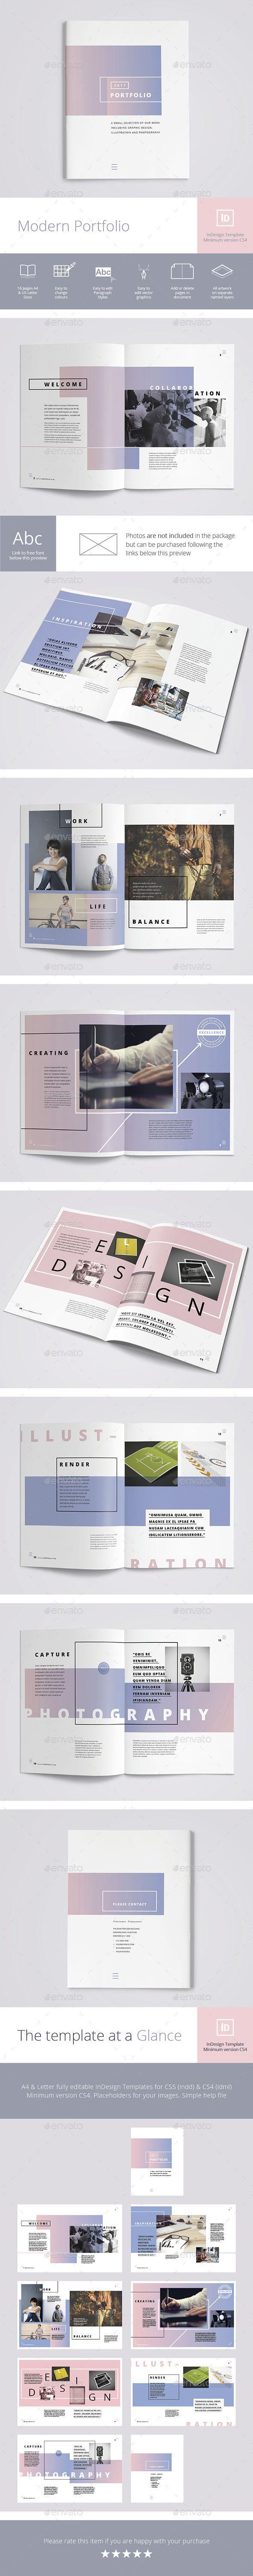 Minimal Indesign Catalogue | Minimal, Template and Catalog